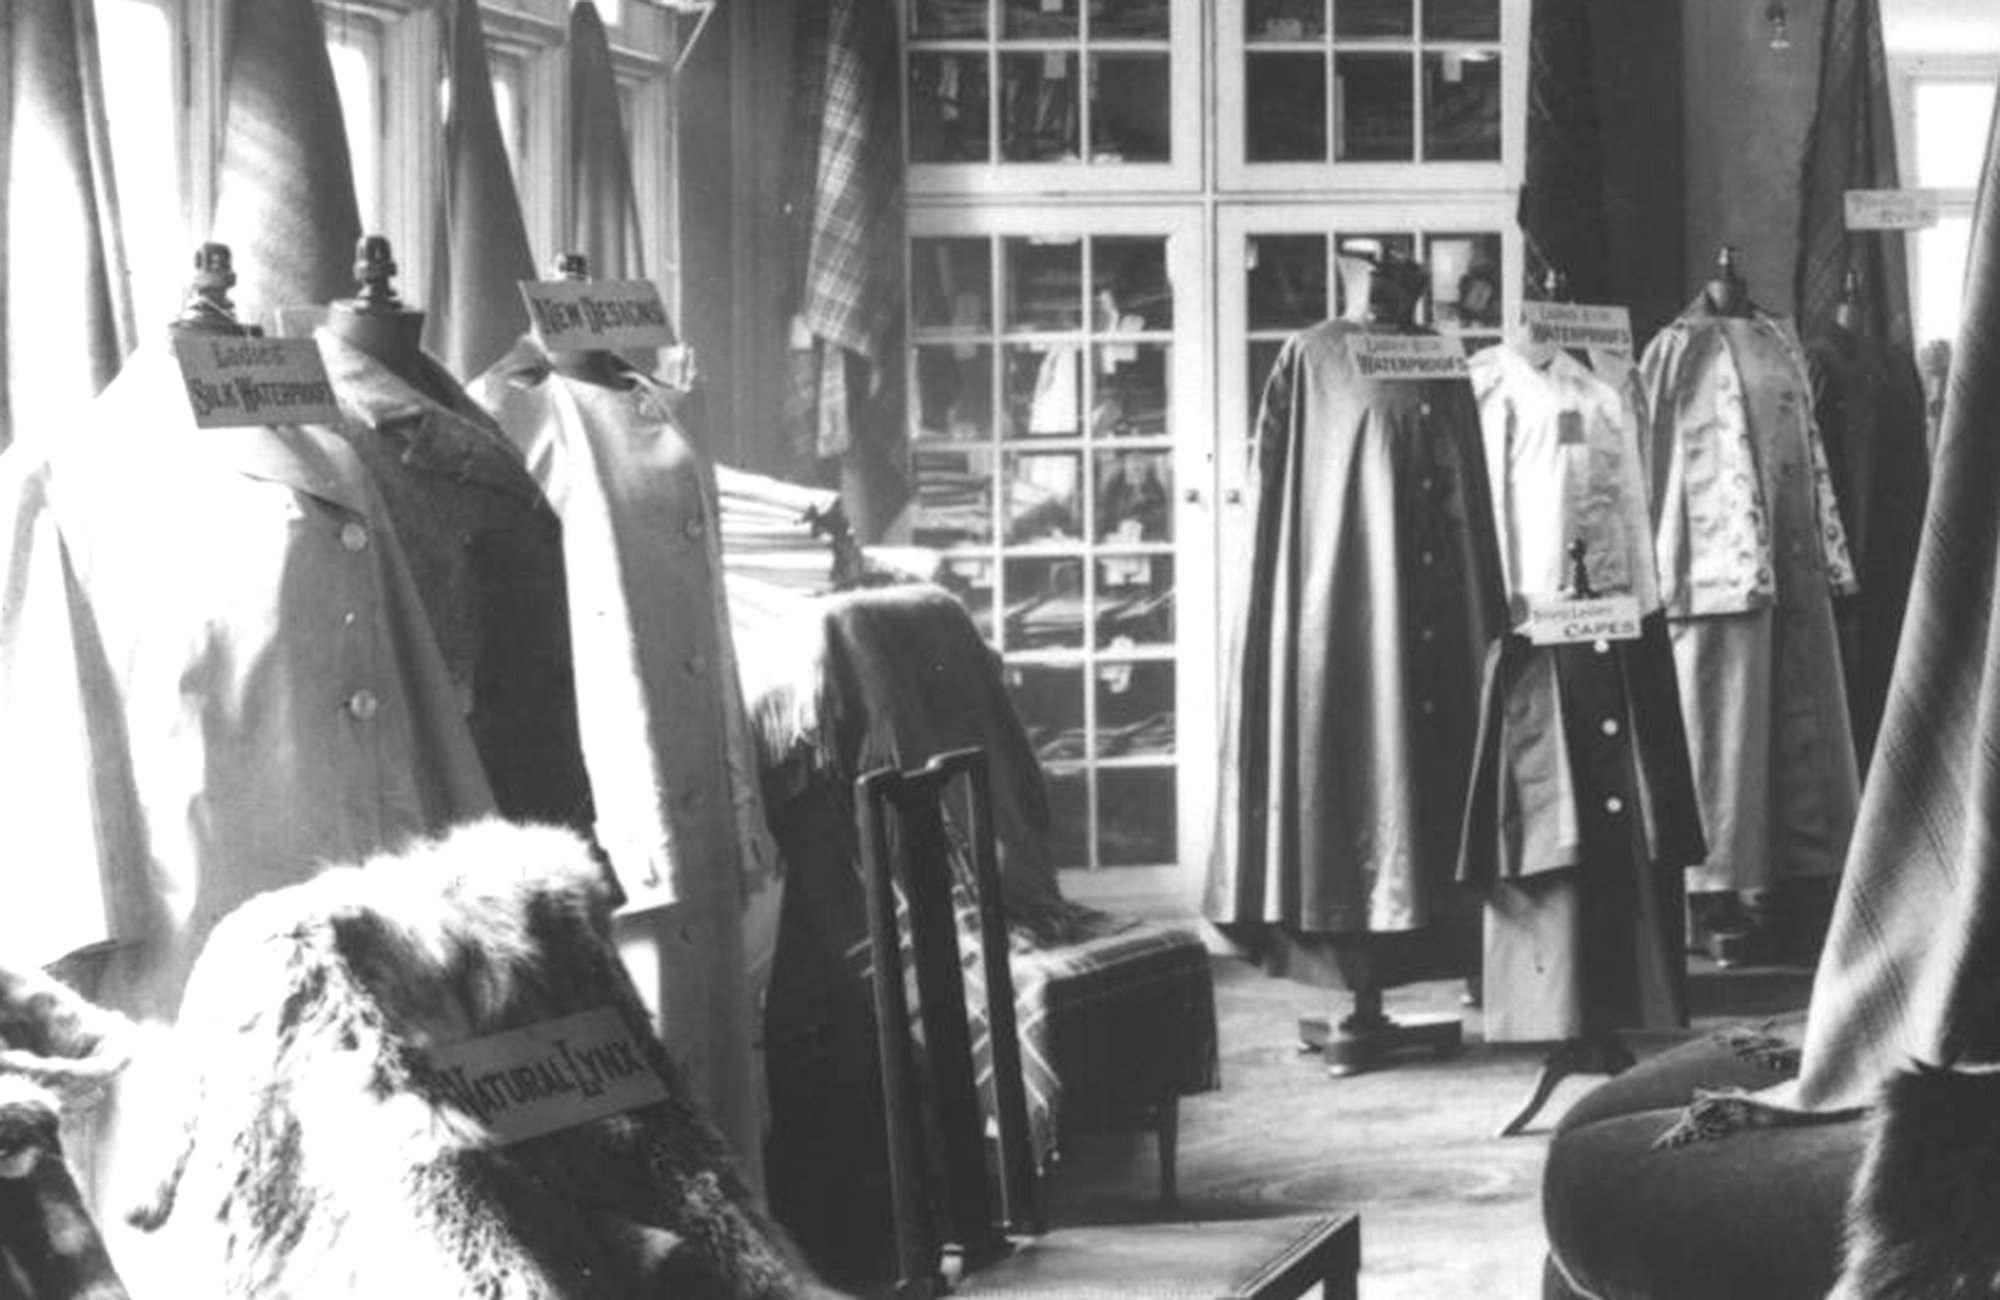 Cordings interior circa 1906 showing the outerwear collection.